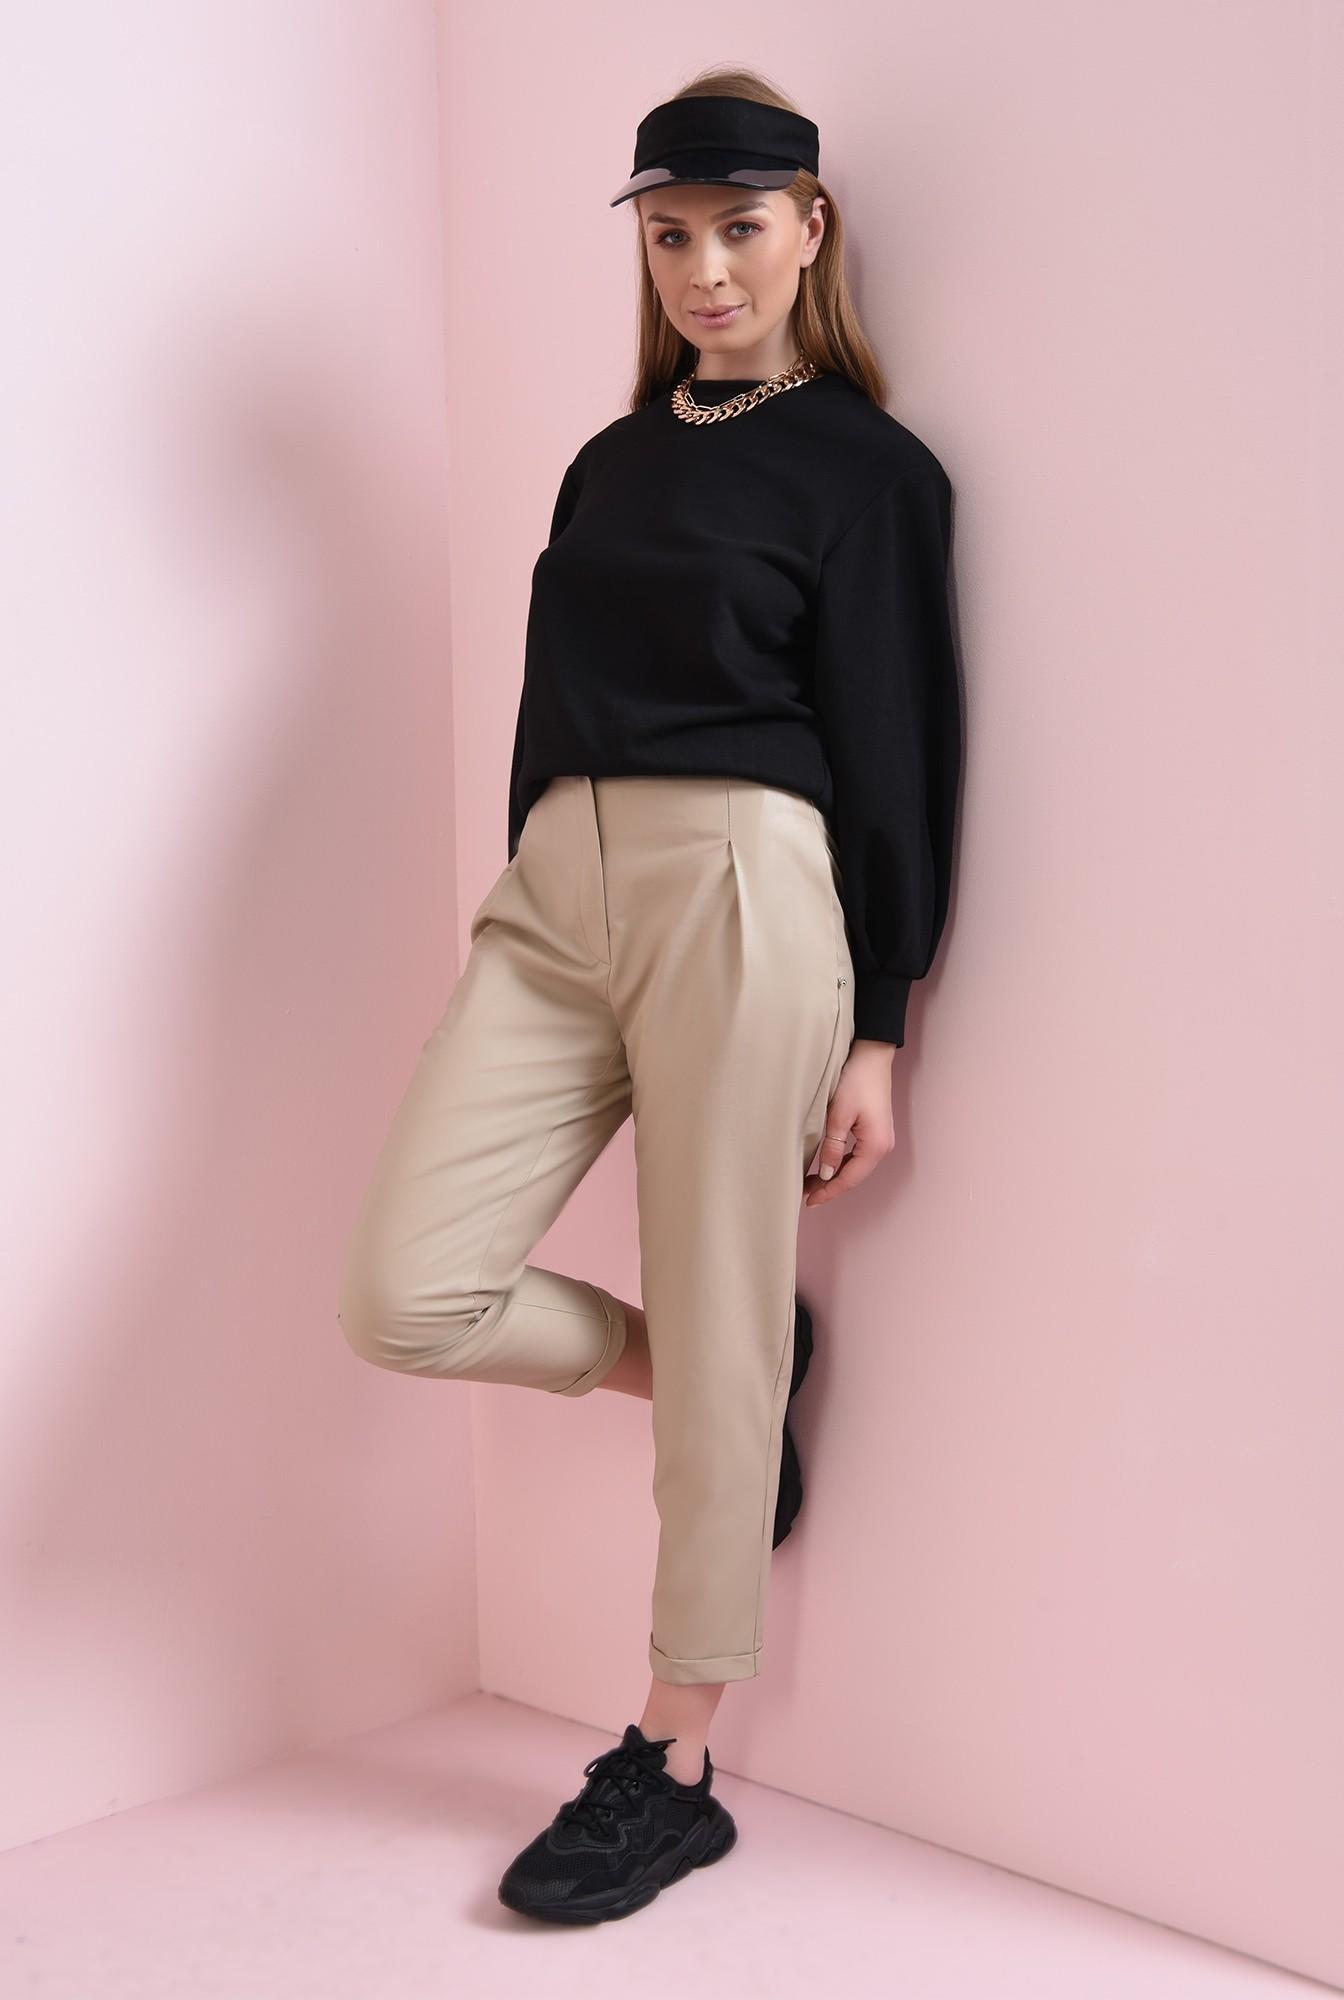 0 - pantaloni casual, cu talie medie, cu buzunare